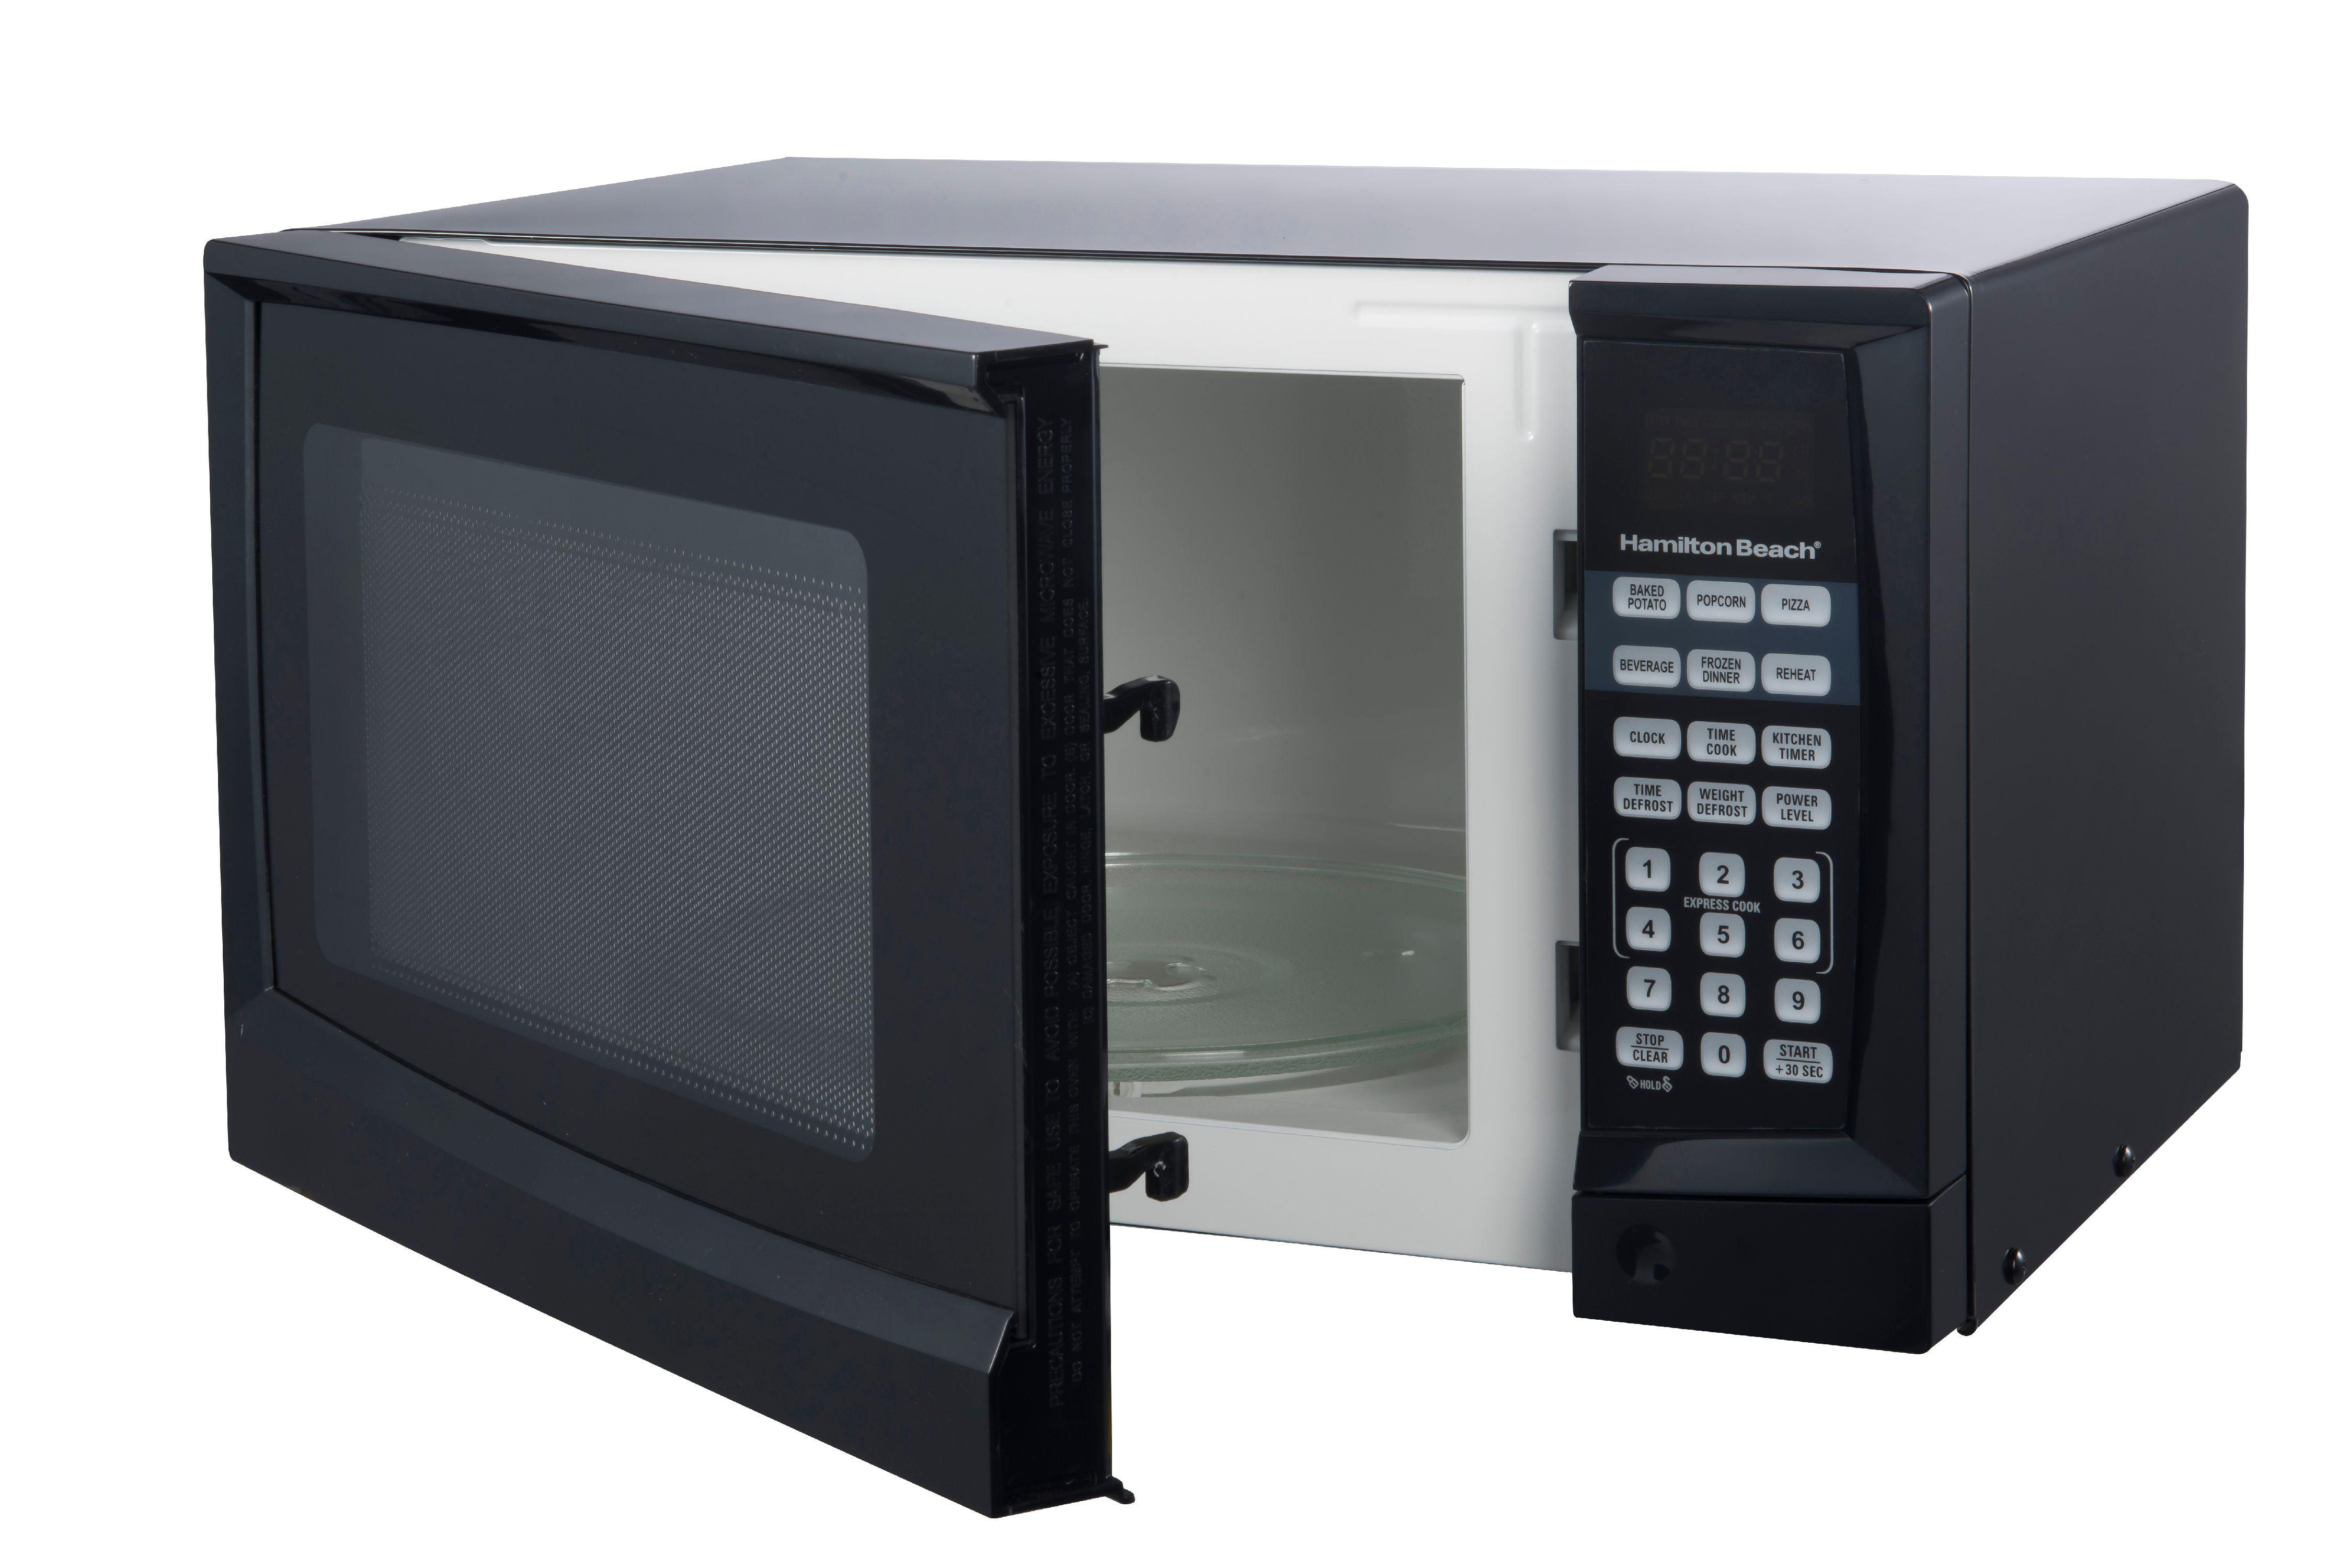 Digital Compact 0 9 Cu Ft Hamilton Beach 900 Watt Bedroom